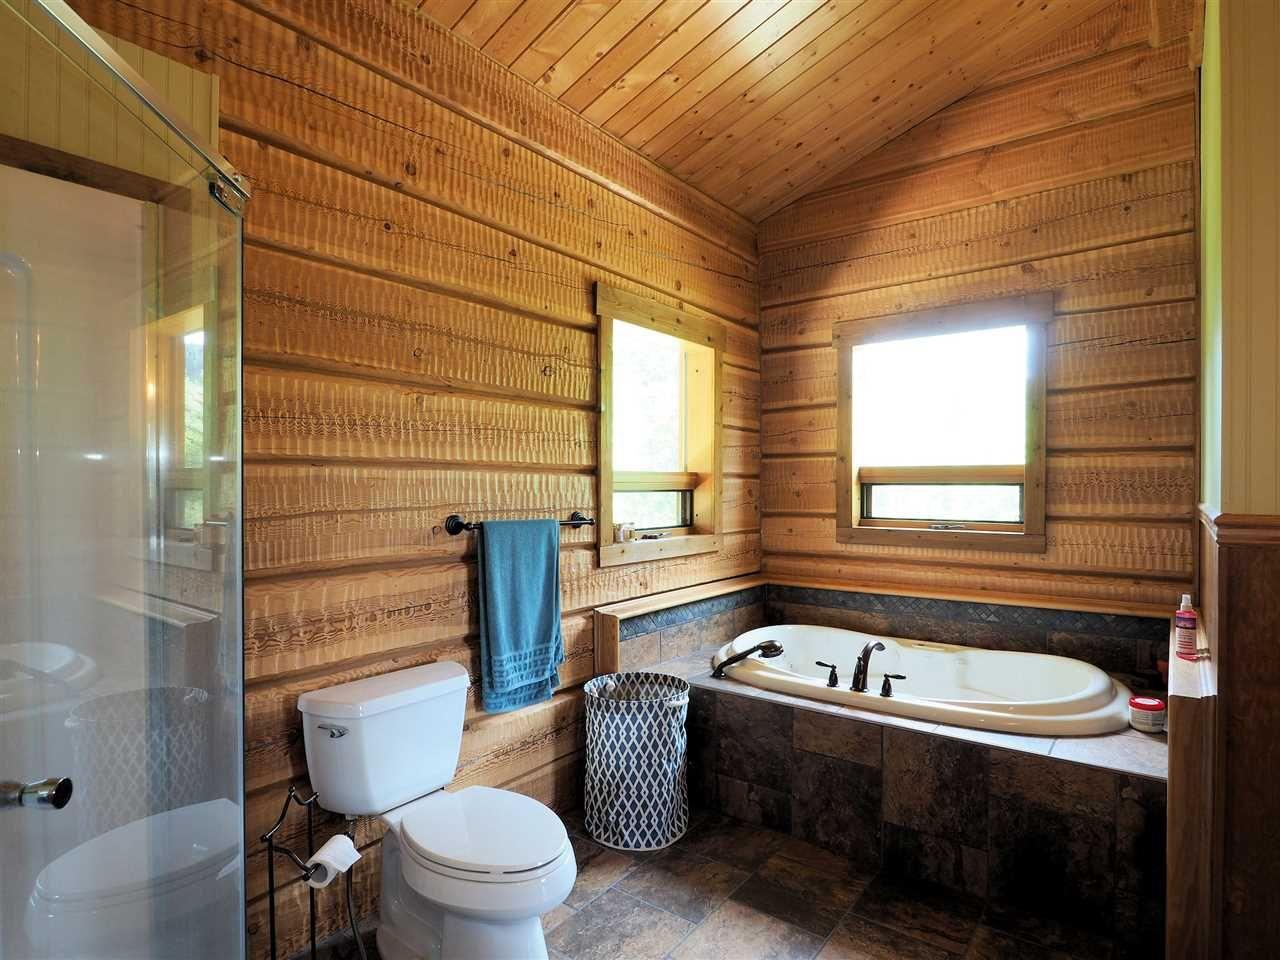 Photo 14: Photos: 4050 CANIM-HENDRIX LAKE Road in Canim Lake: Canim/Mahood Lake House for sale (100 Mile House (Zone 10))  : MLS®# R2396282